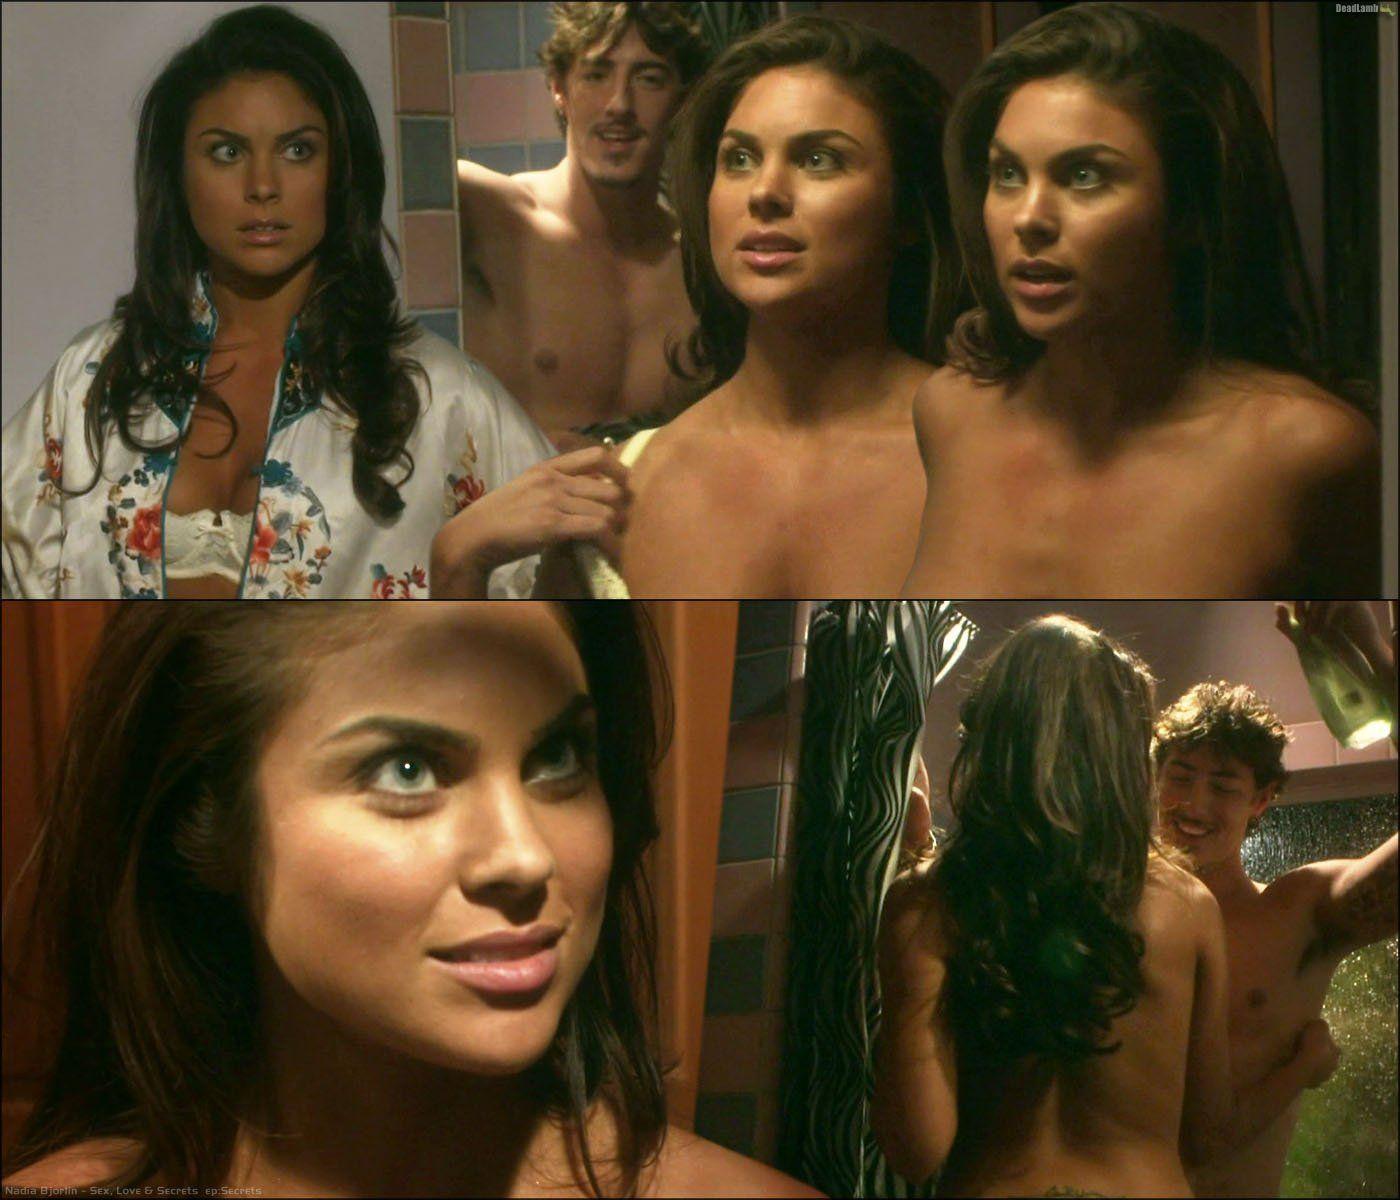 Nadja Mature Porn nadia bjorlin porn video - new porn.